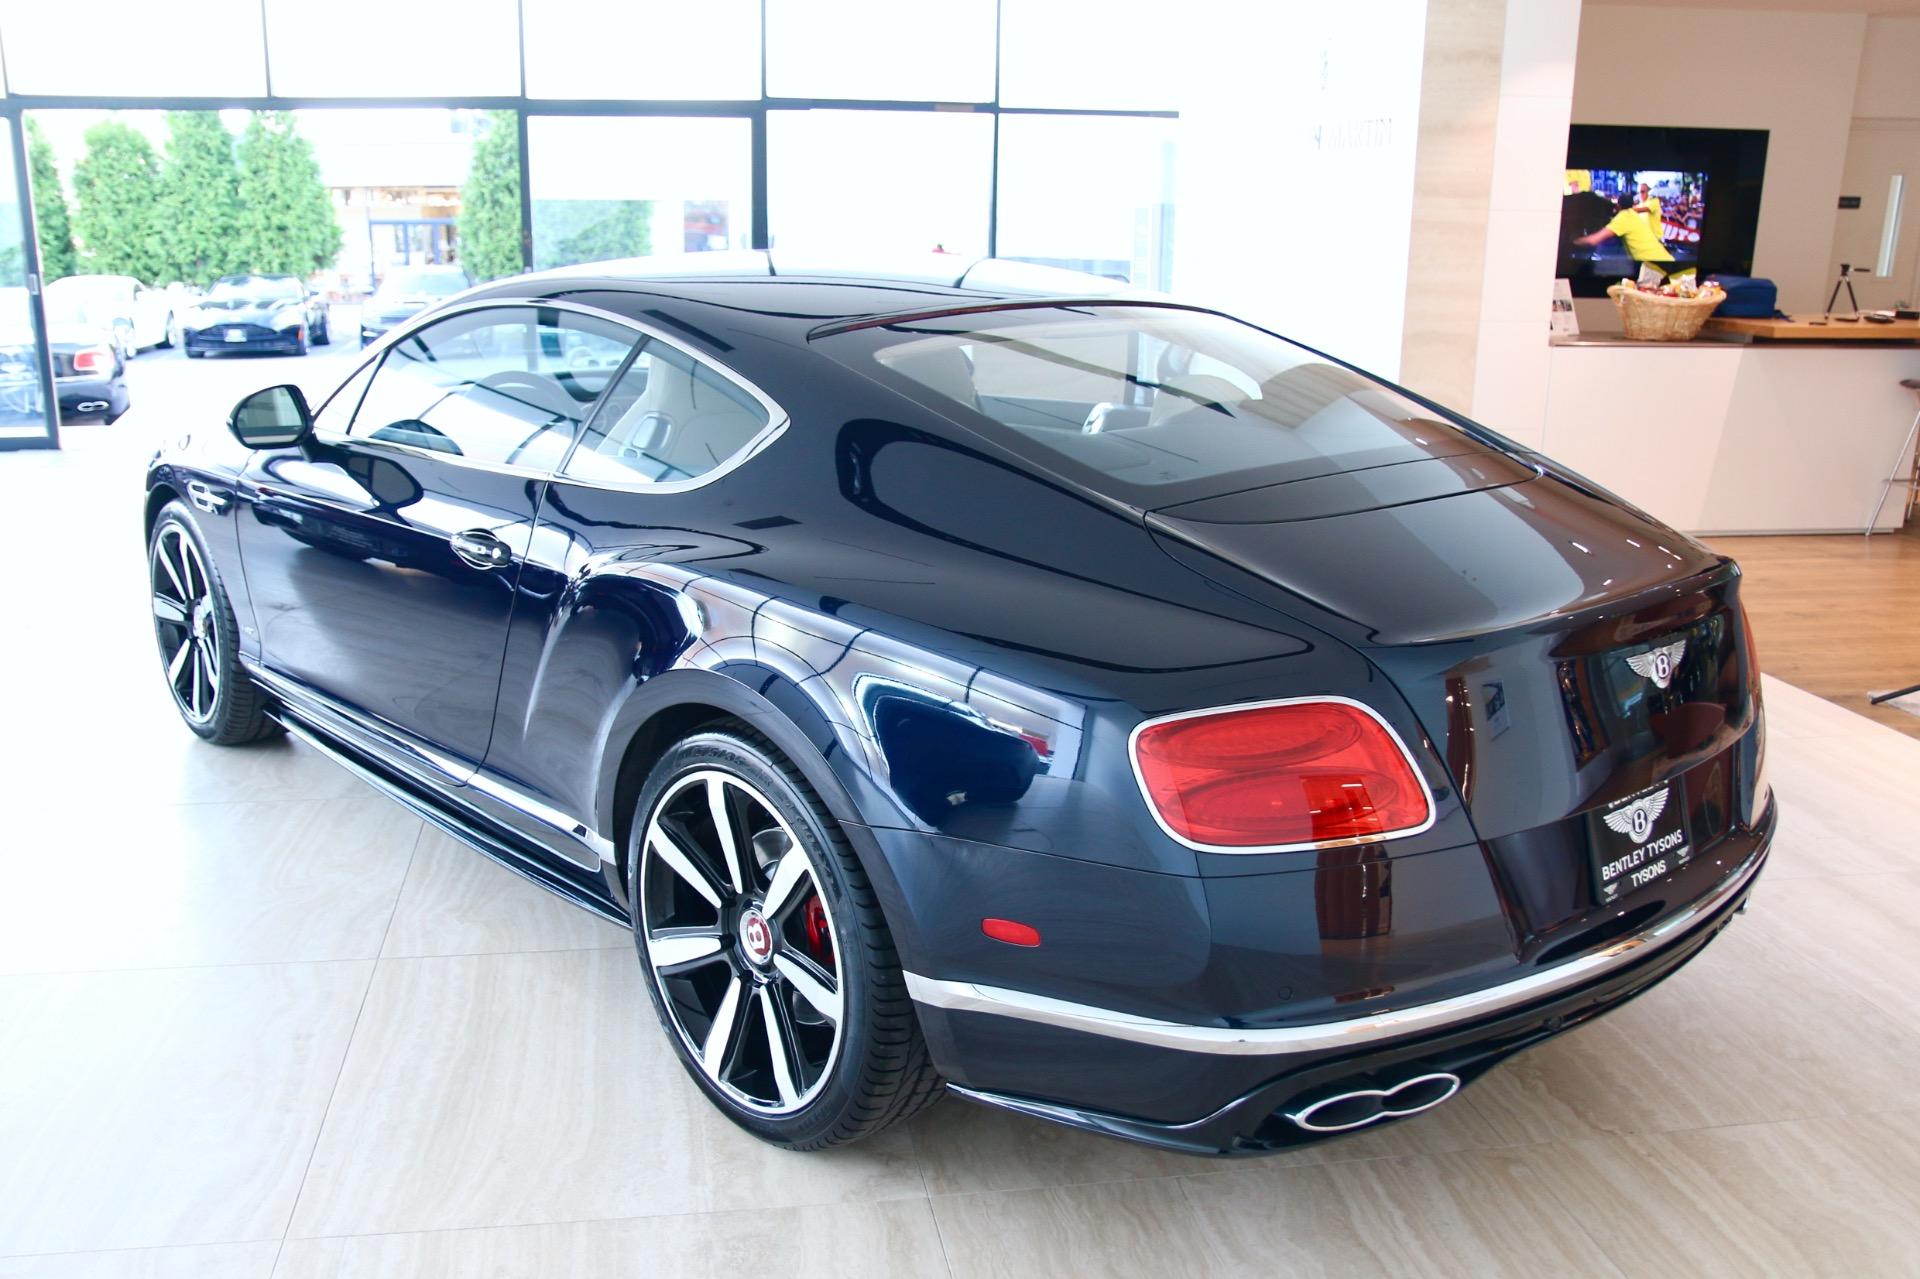 2017 Bentley Continental Gt V8 S Stock 7nc065271 For Sale Near Vienna Va Va Bentley Dealer